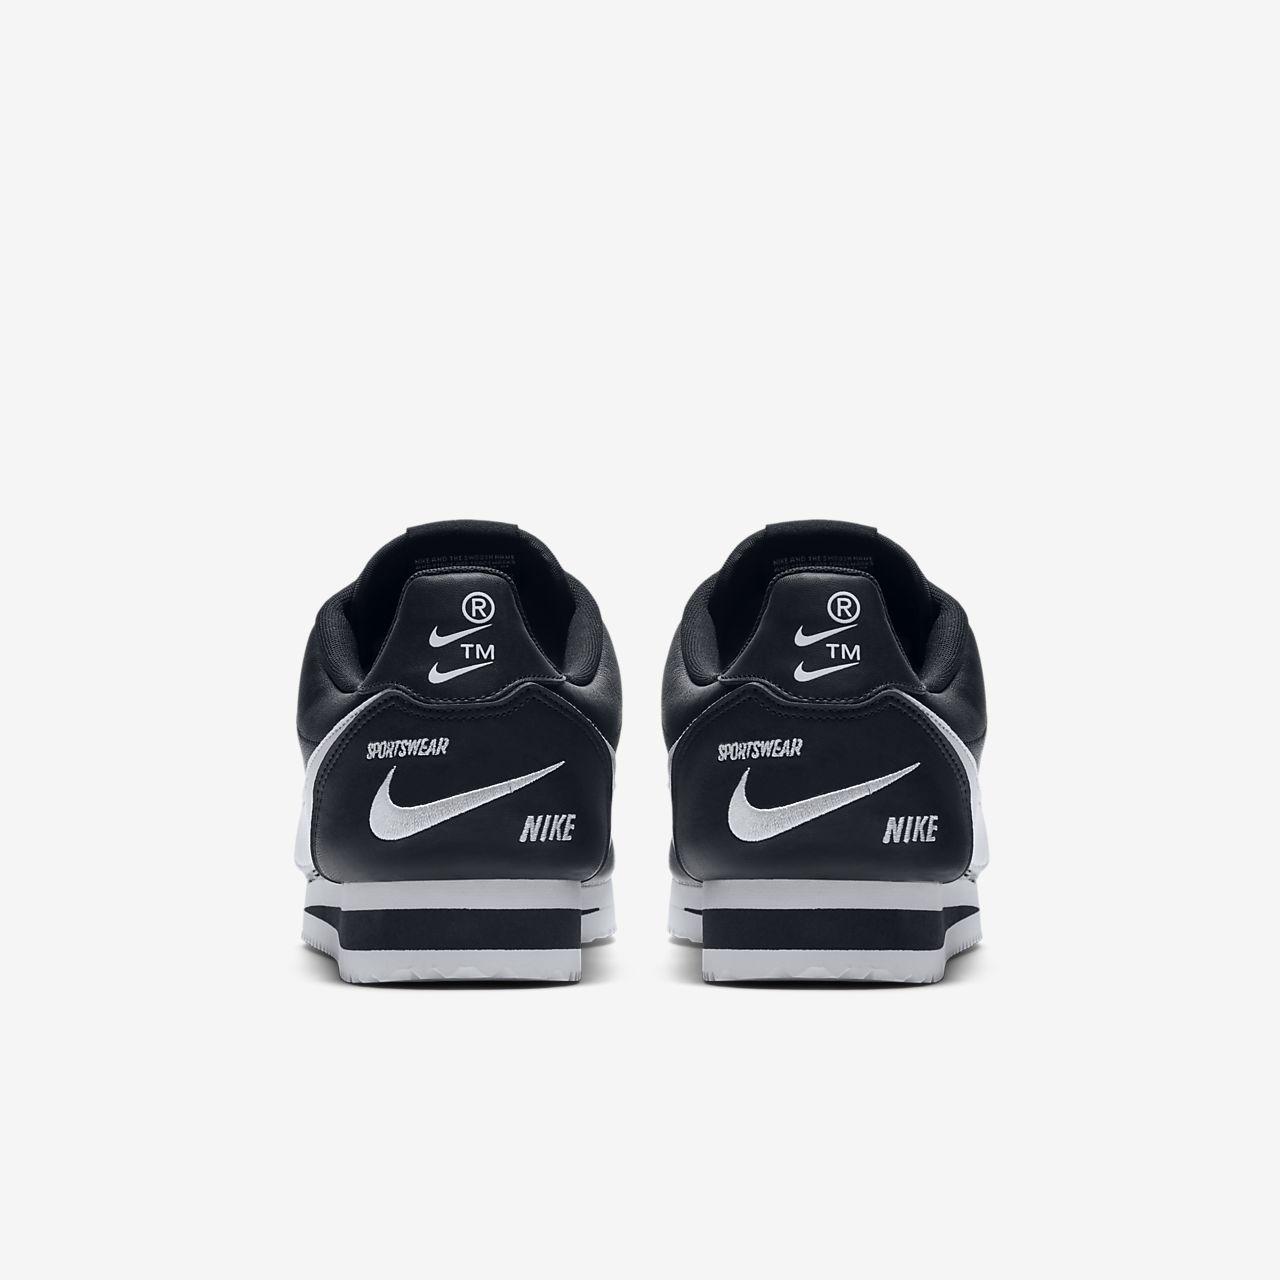 best service 5e45f 13be1 Low Resolution Unisexsko Nike Classic Cortez Premium Unisexsko Nike Classic  Cortez Premium